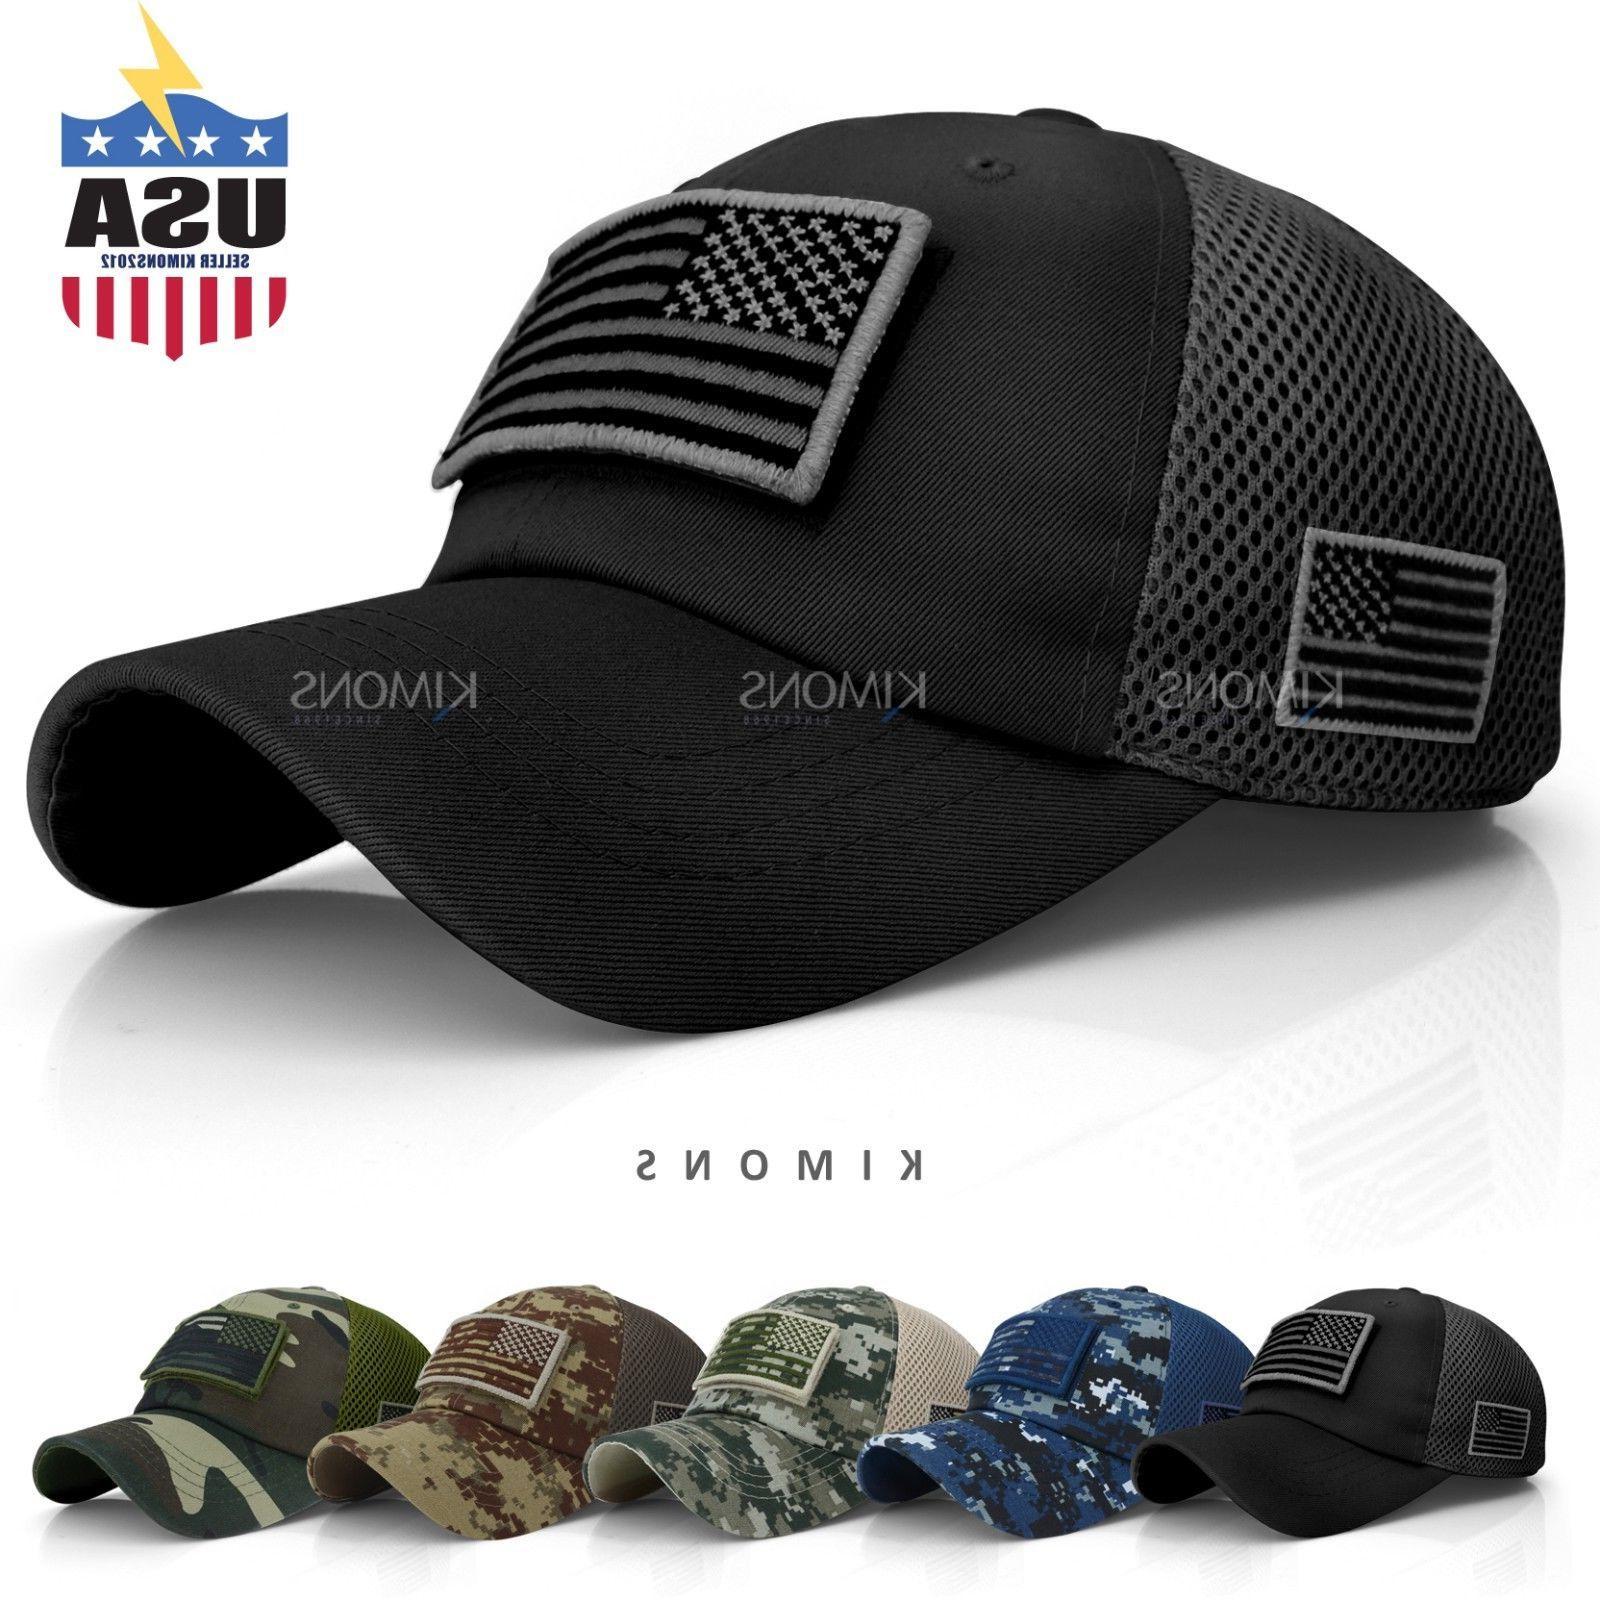 USA American Military Army cap